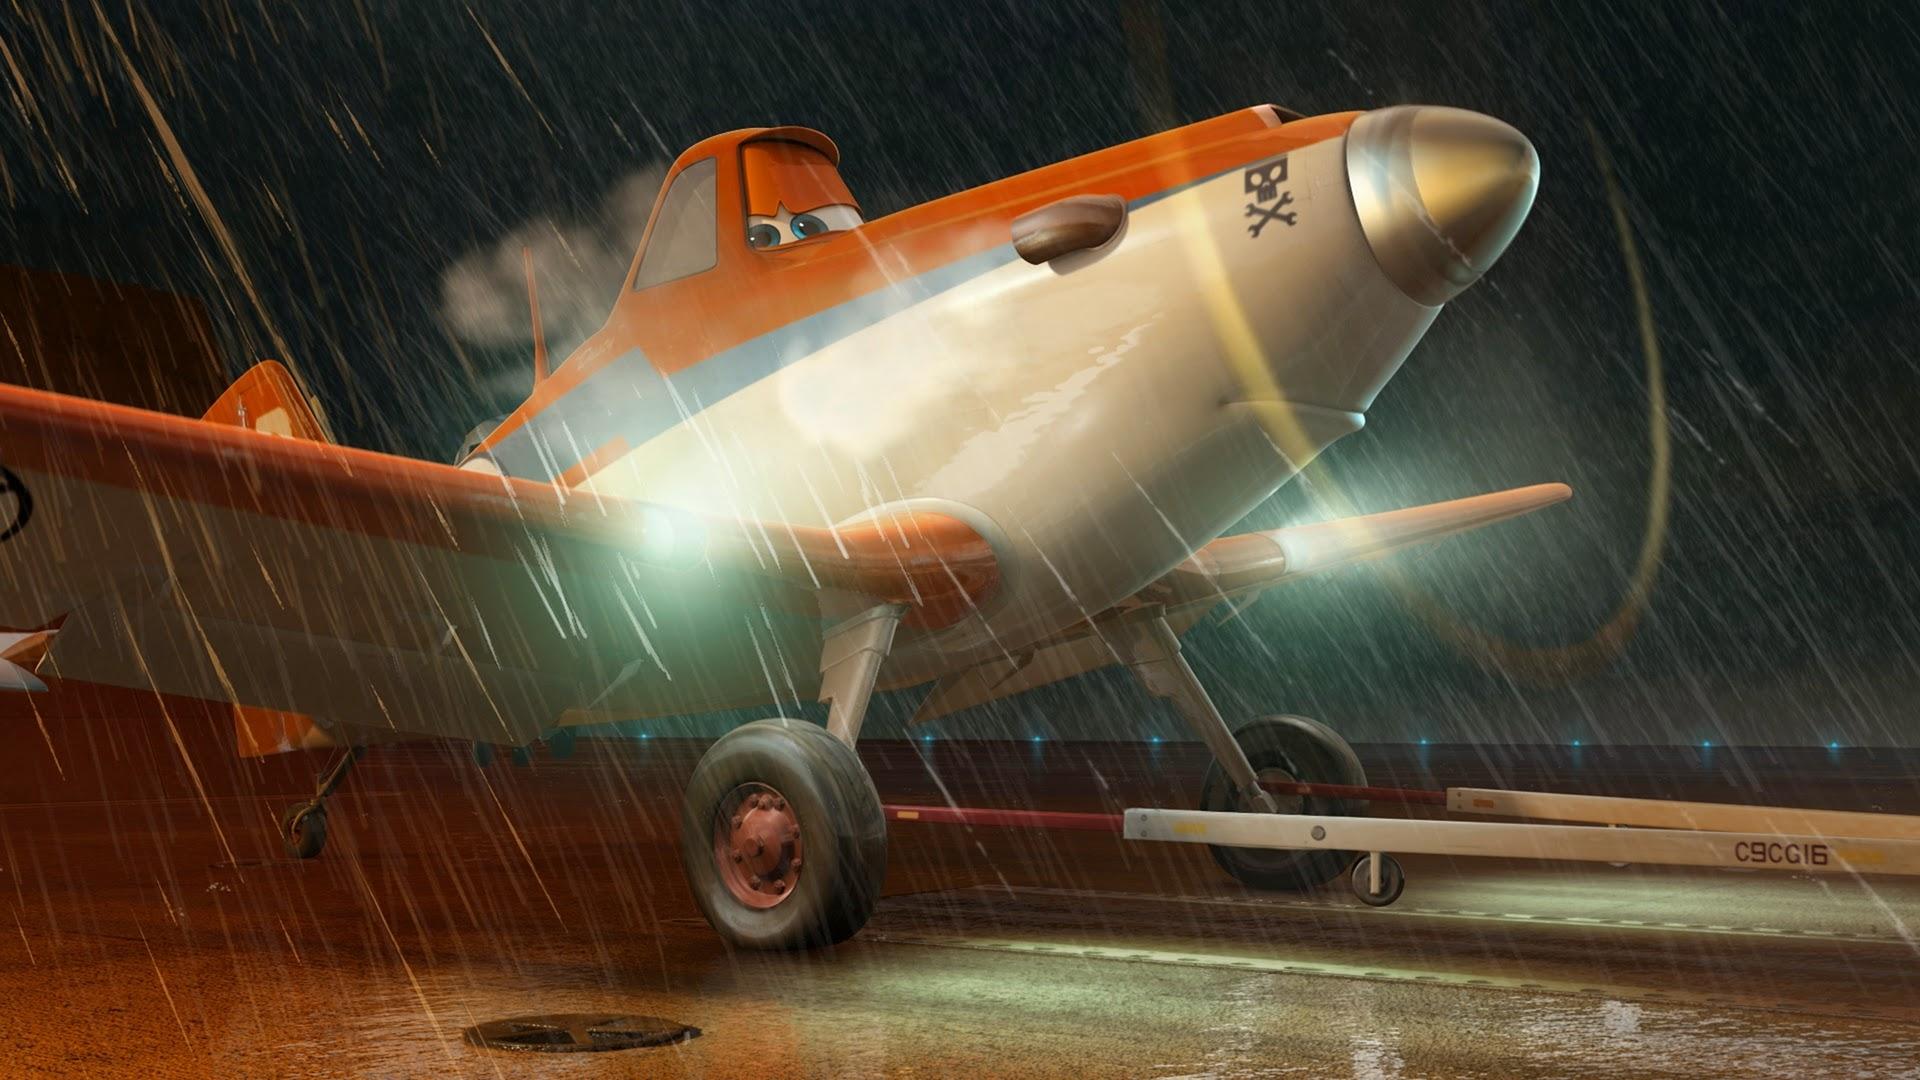 disney planes movie wallpapers - photo #28